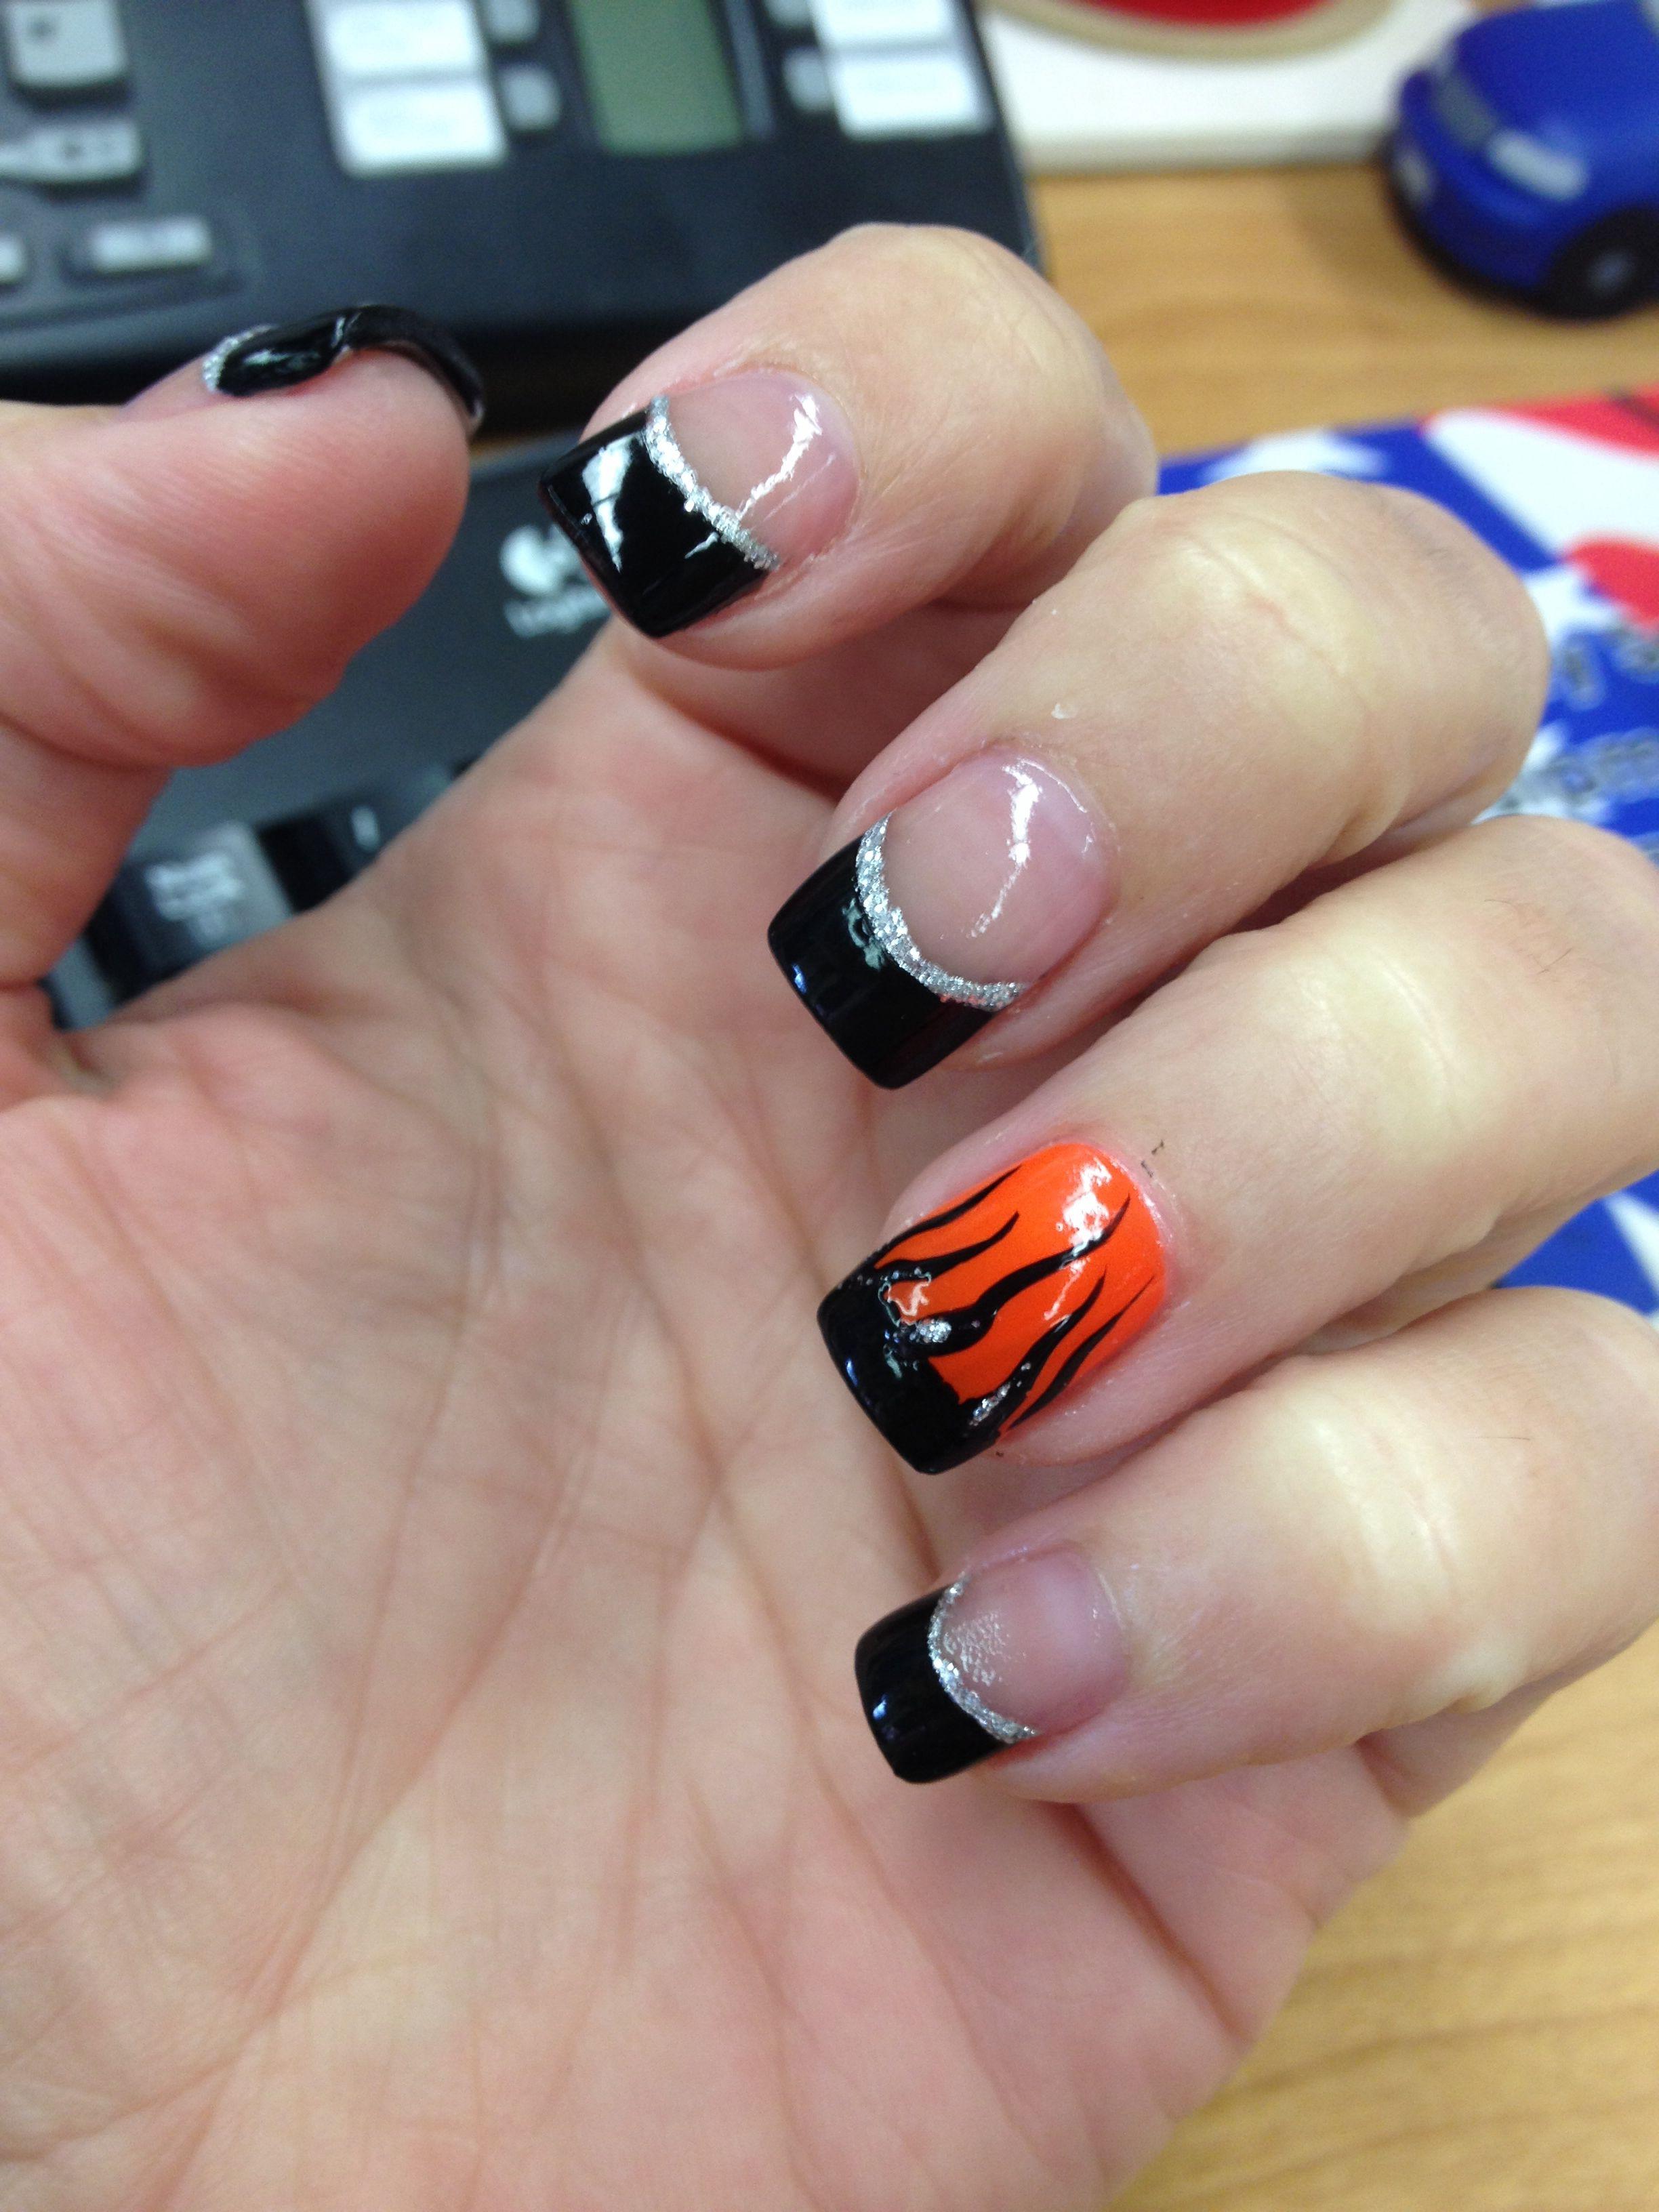 flame nails beauti-licious